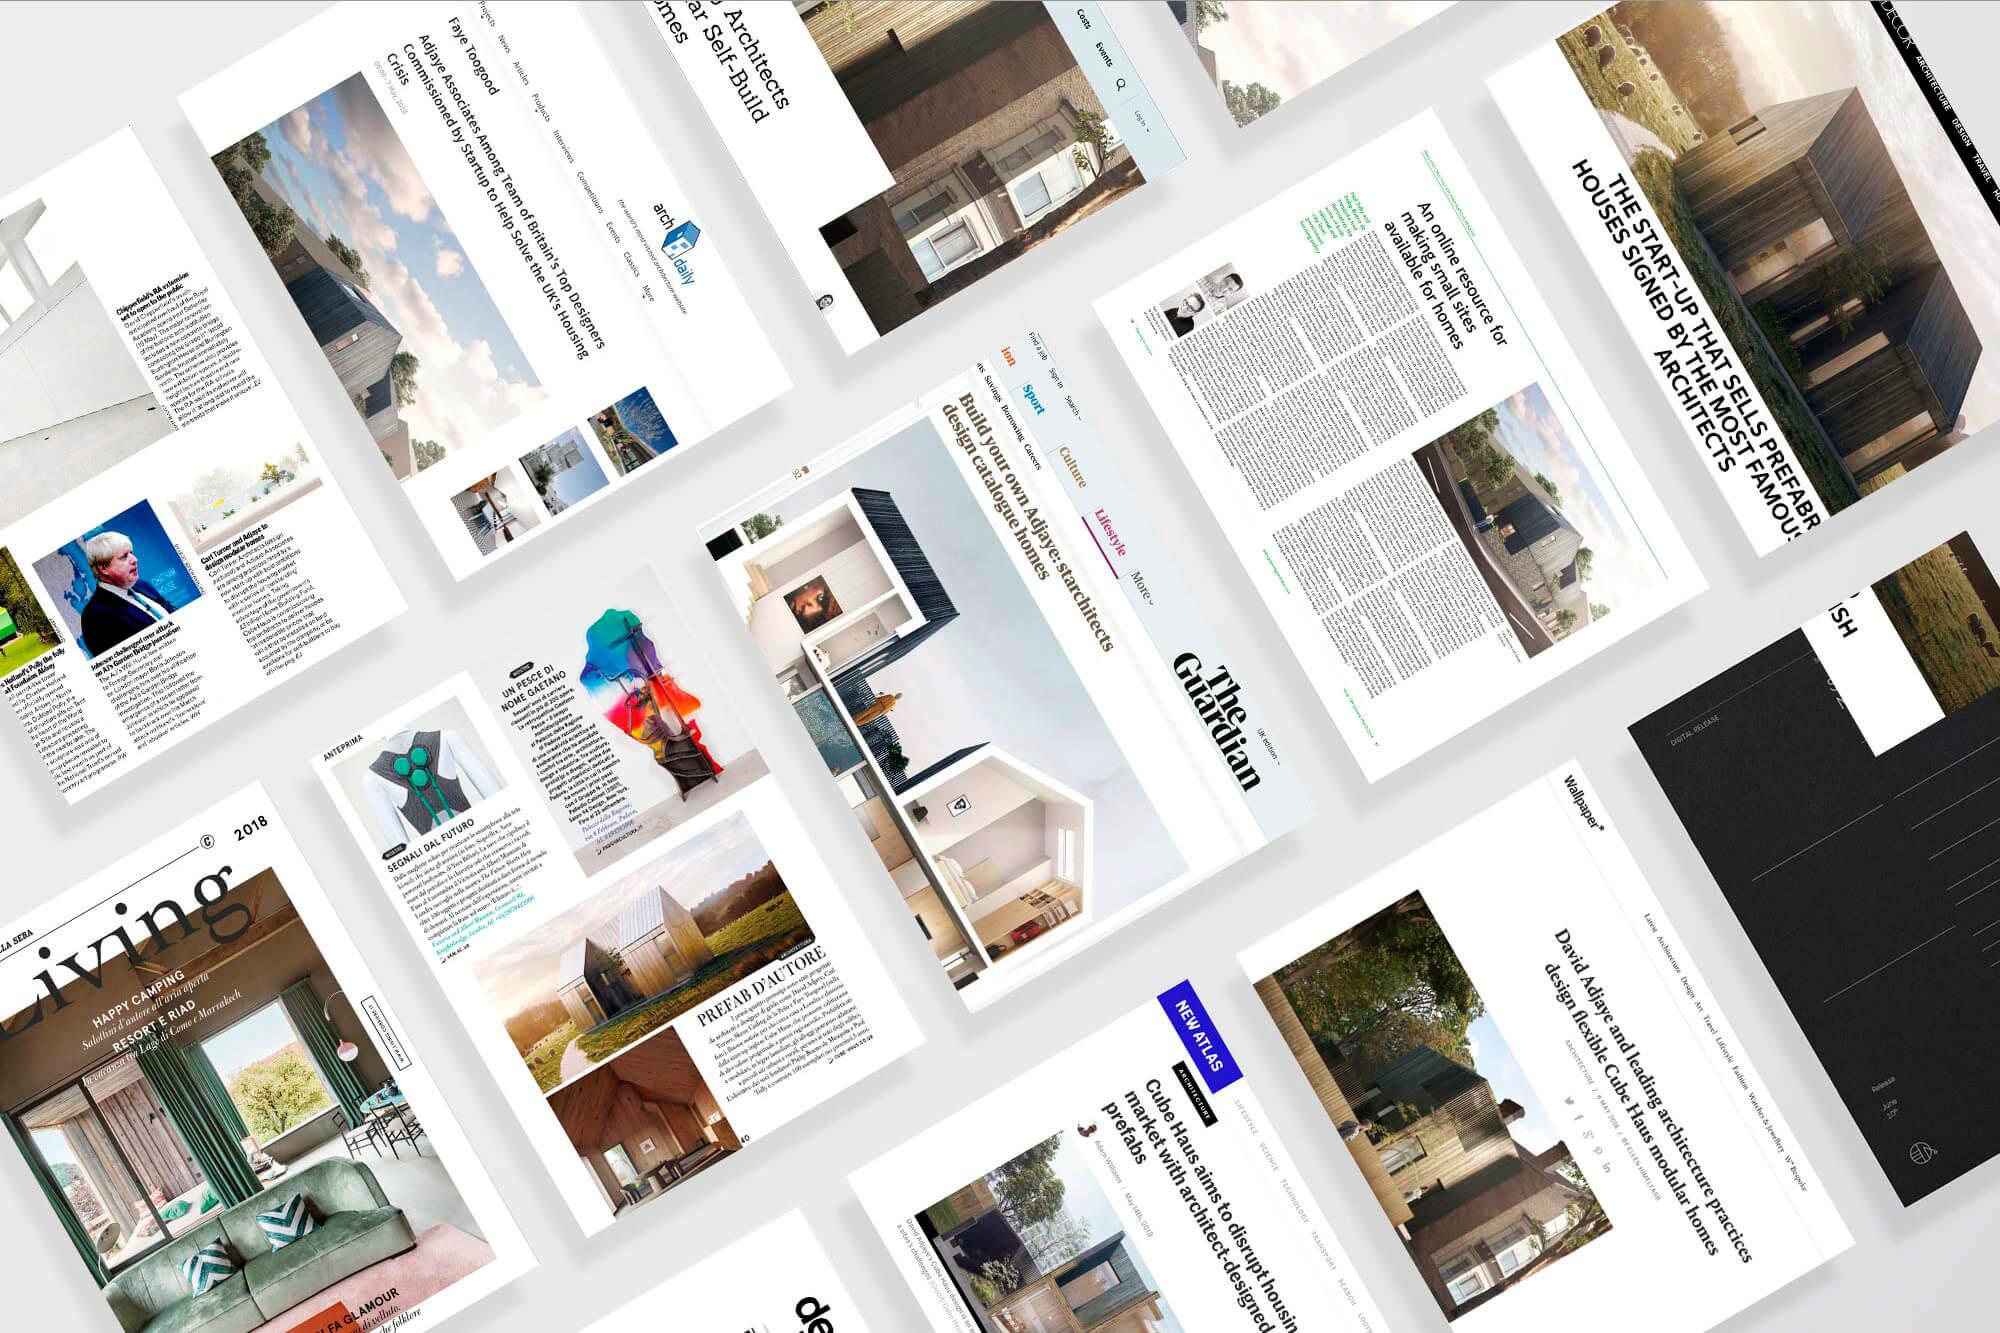 gpj-studio-cube-haus-architects-website-cs-06